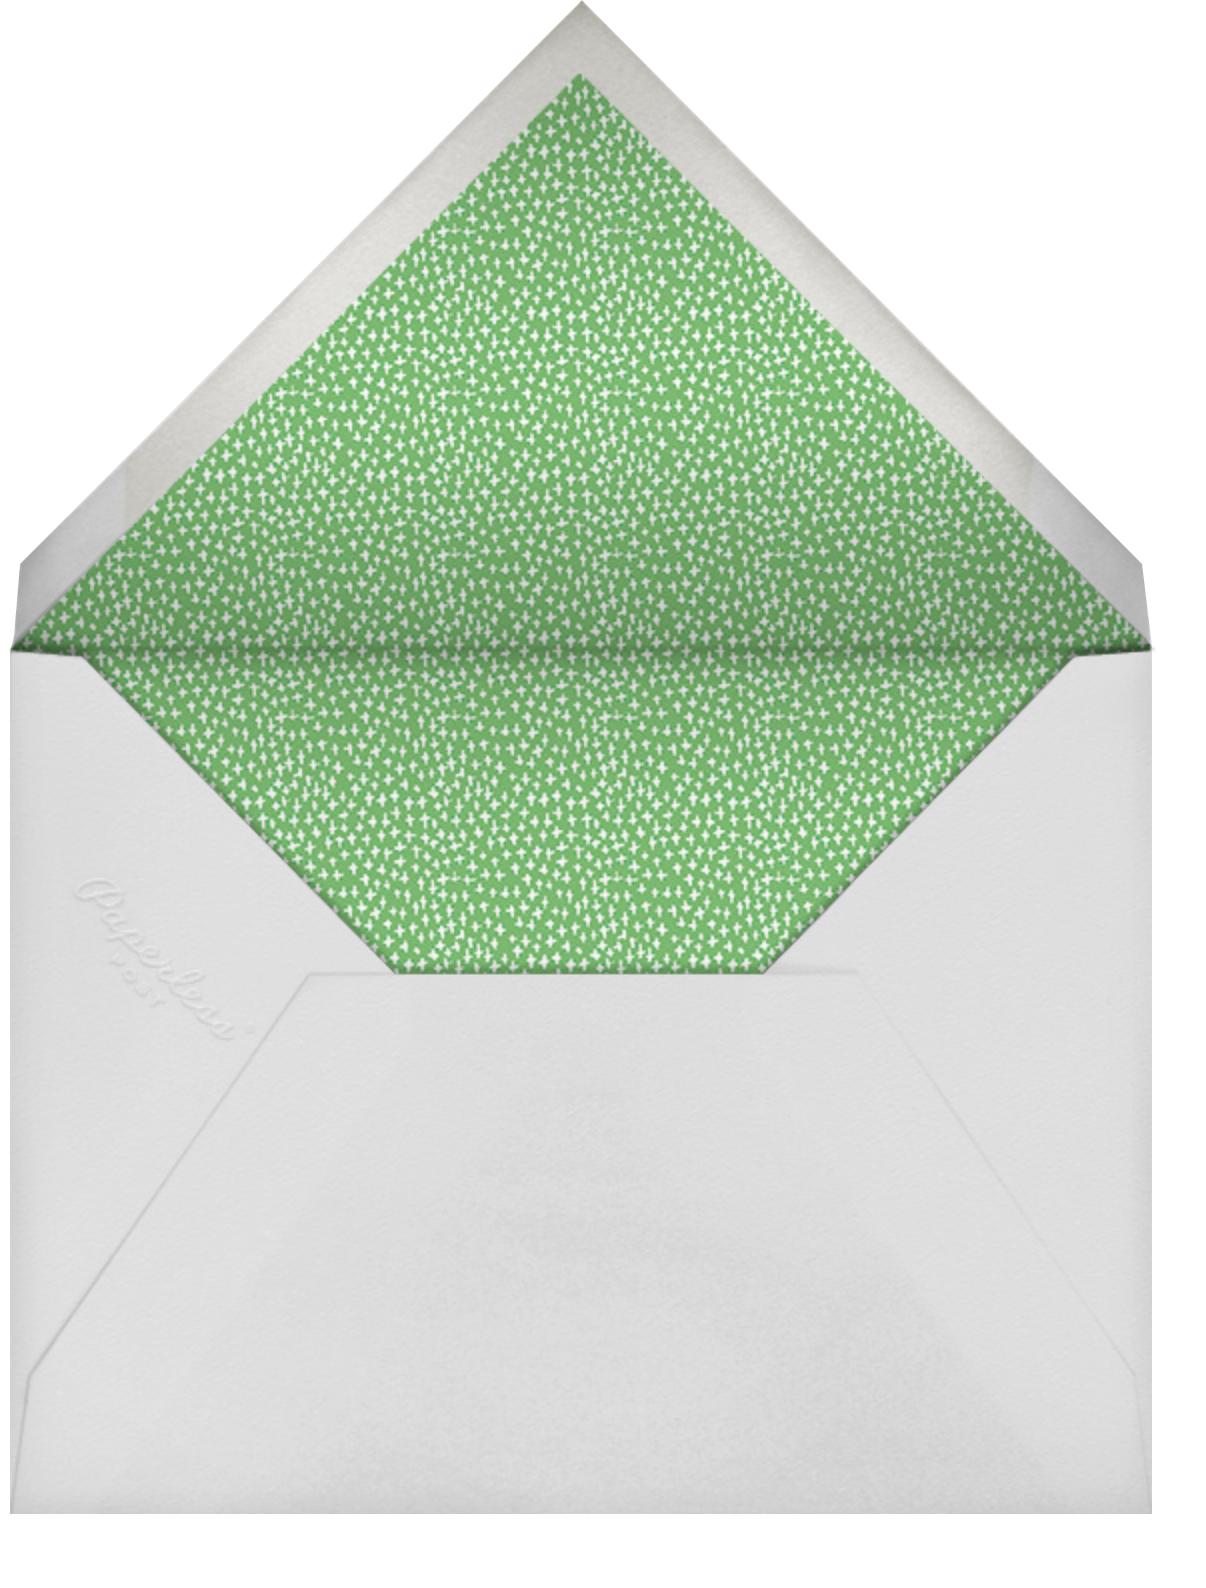 Among the Daisies - Citrus - Mr. Boddington's Studio - Envelope